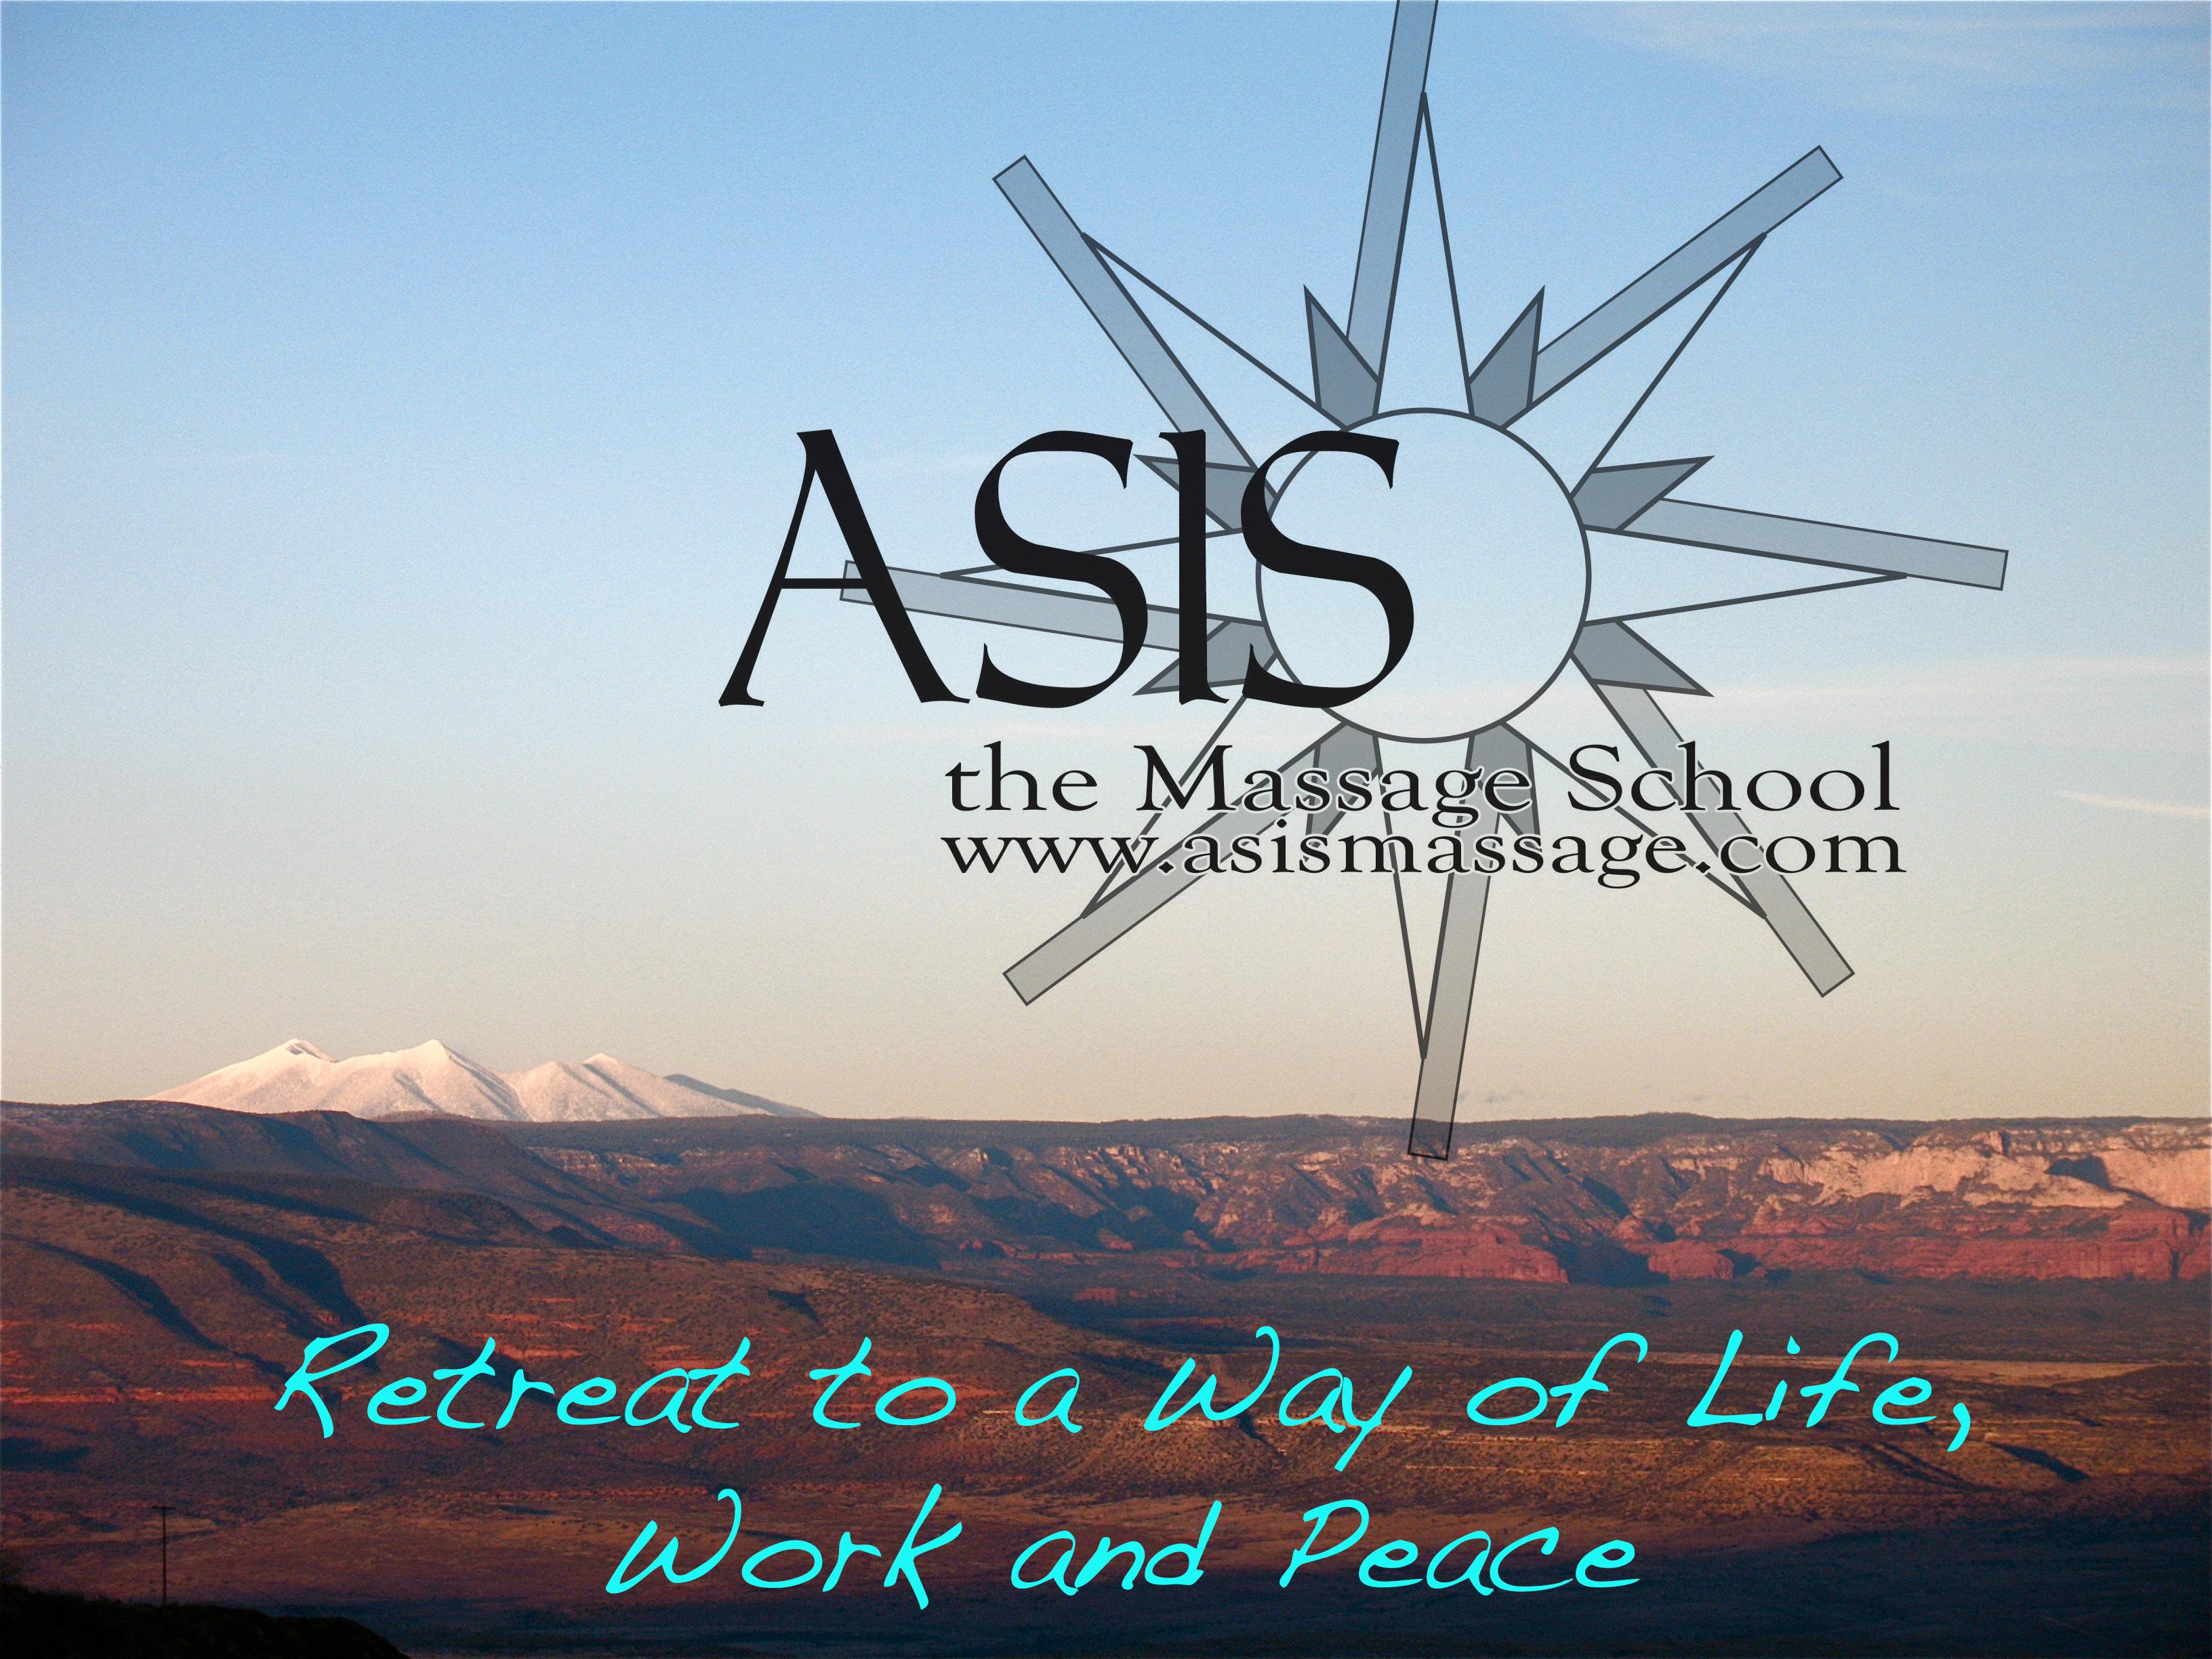 ASIS Massage Education